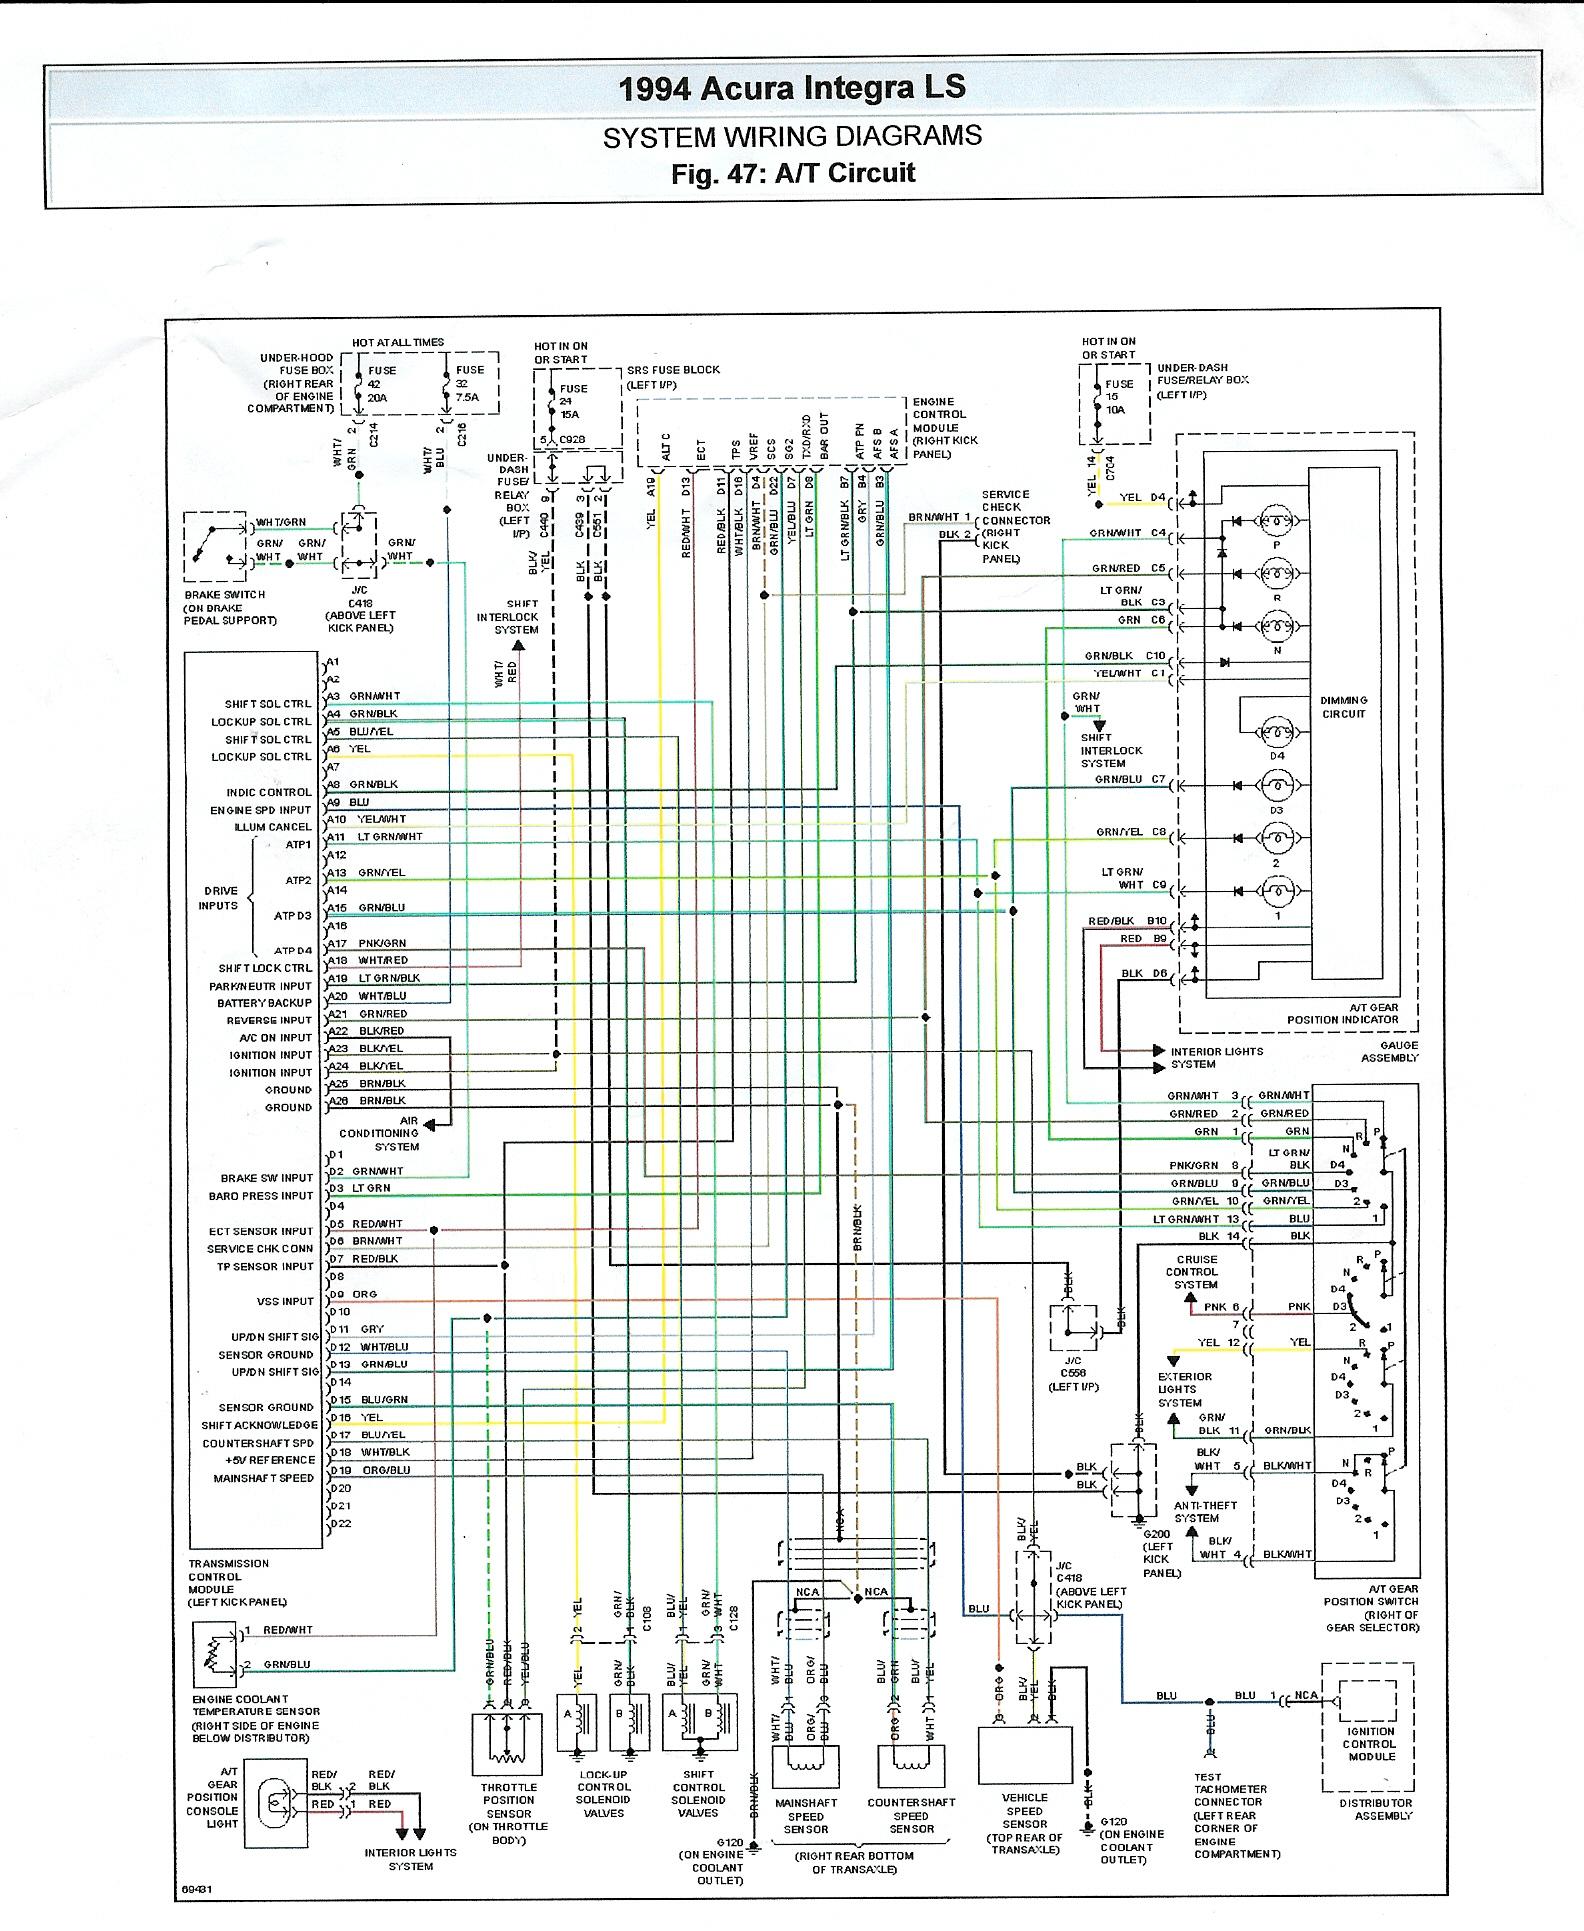 honda civic wiring diagram for 89 - 2004 crown vic fuse box for wiring  diagram schematics  wiring diagram schematics